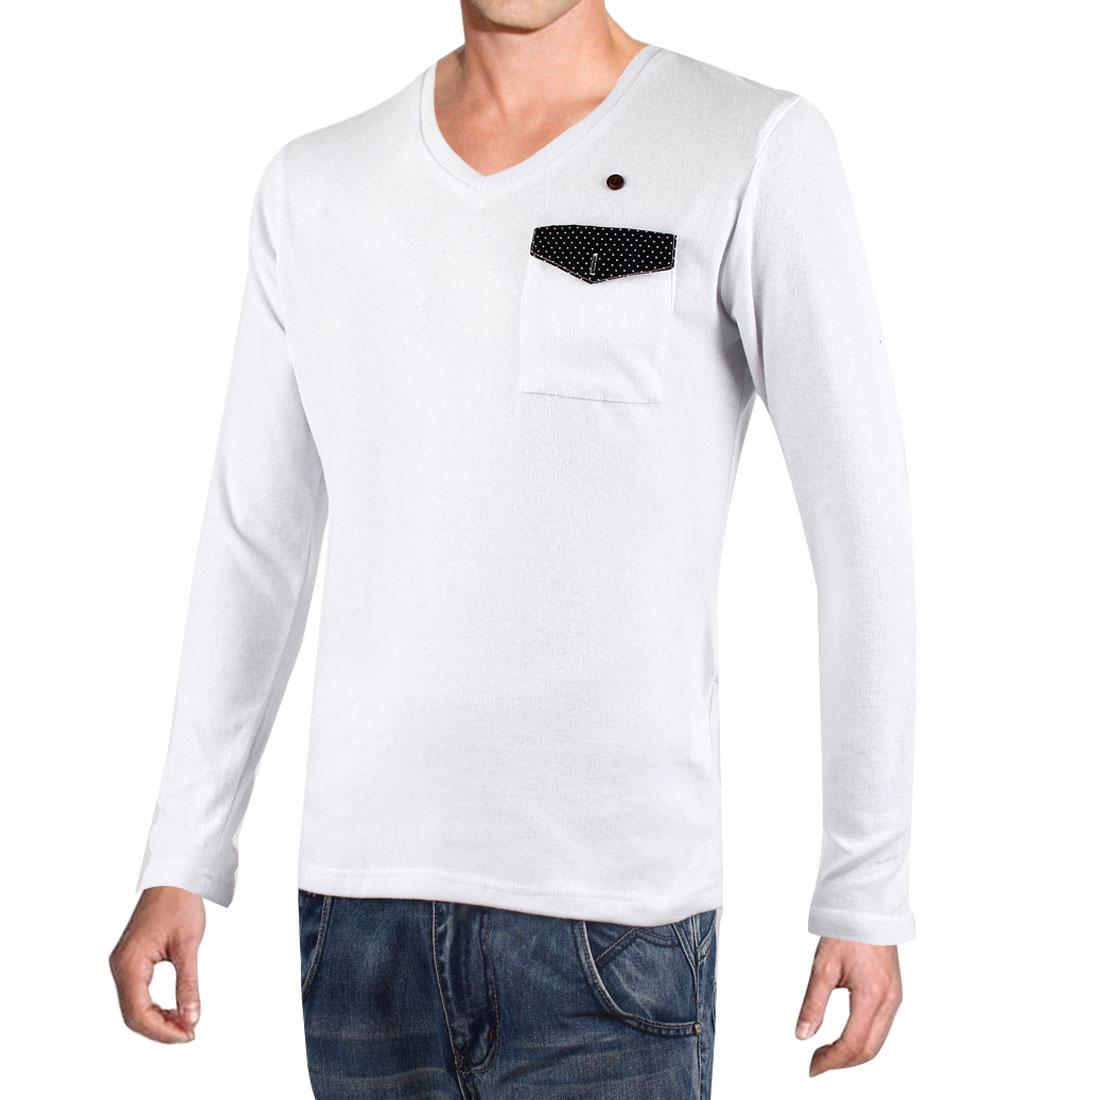 Men White V Neck Long Sleeve Dots Detail Pocket Top Casual Shirt M